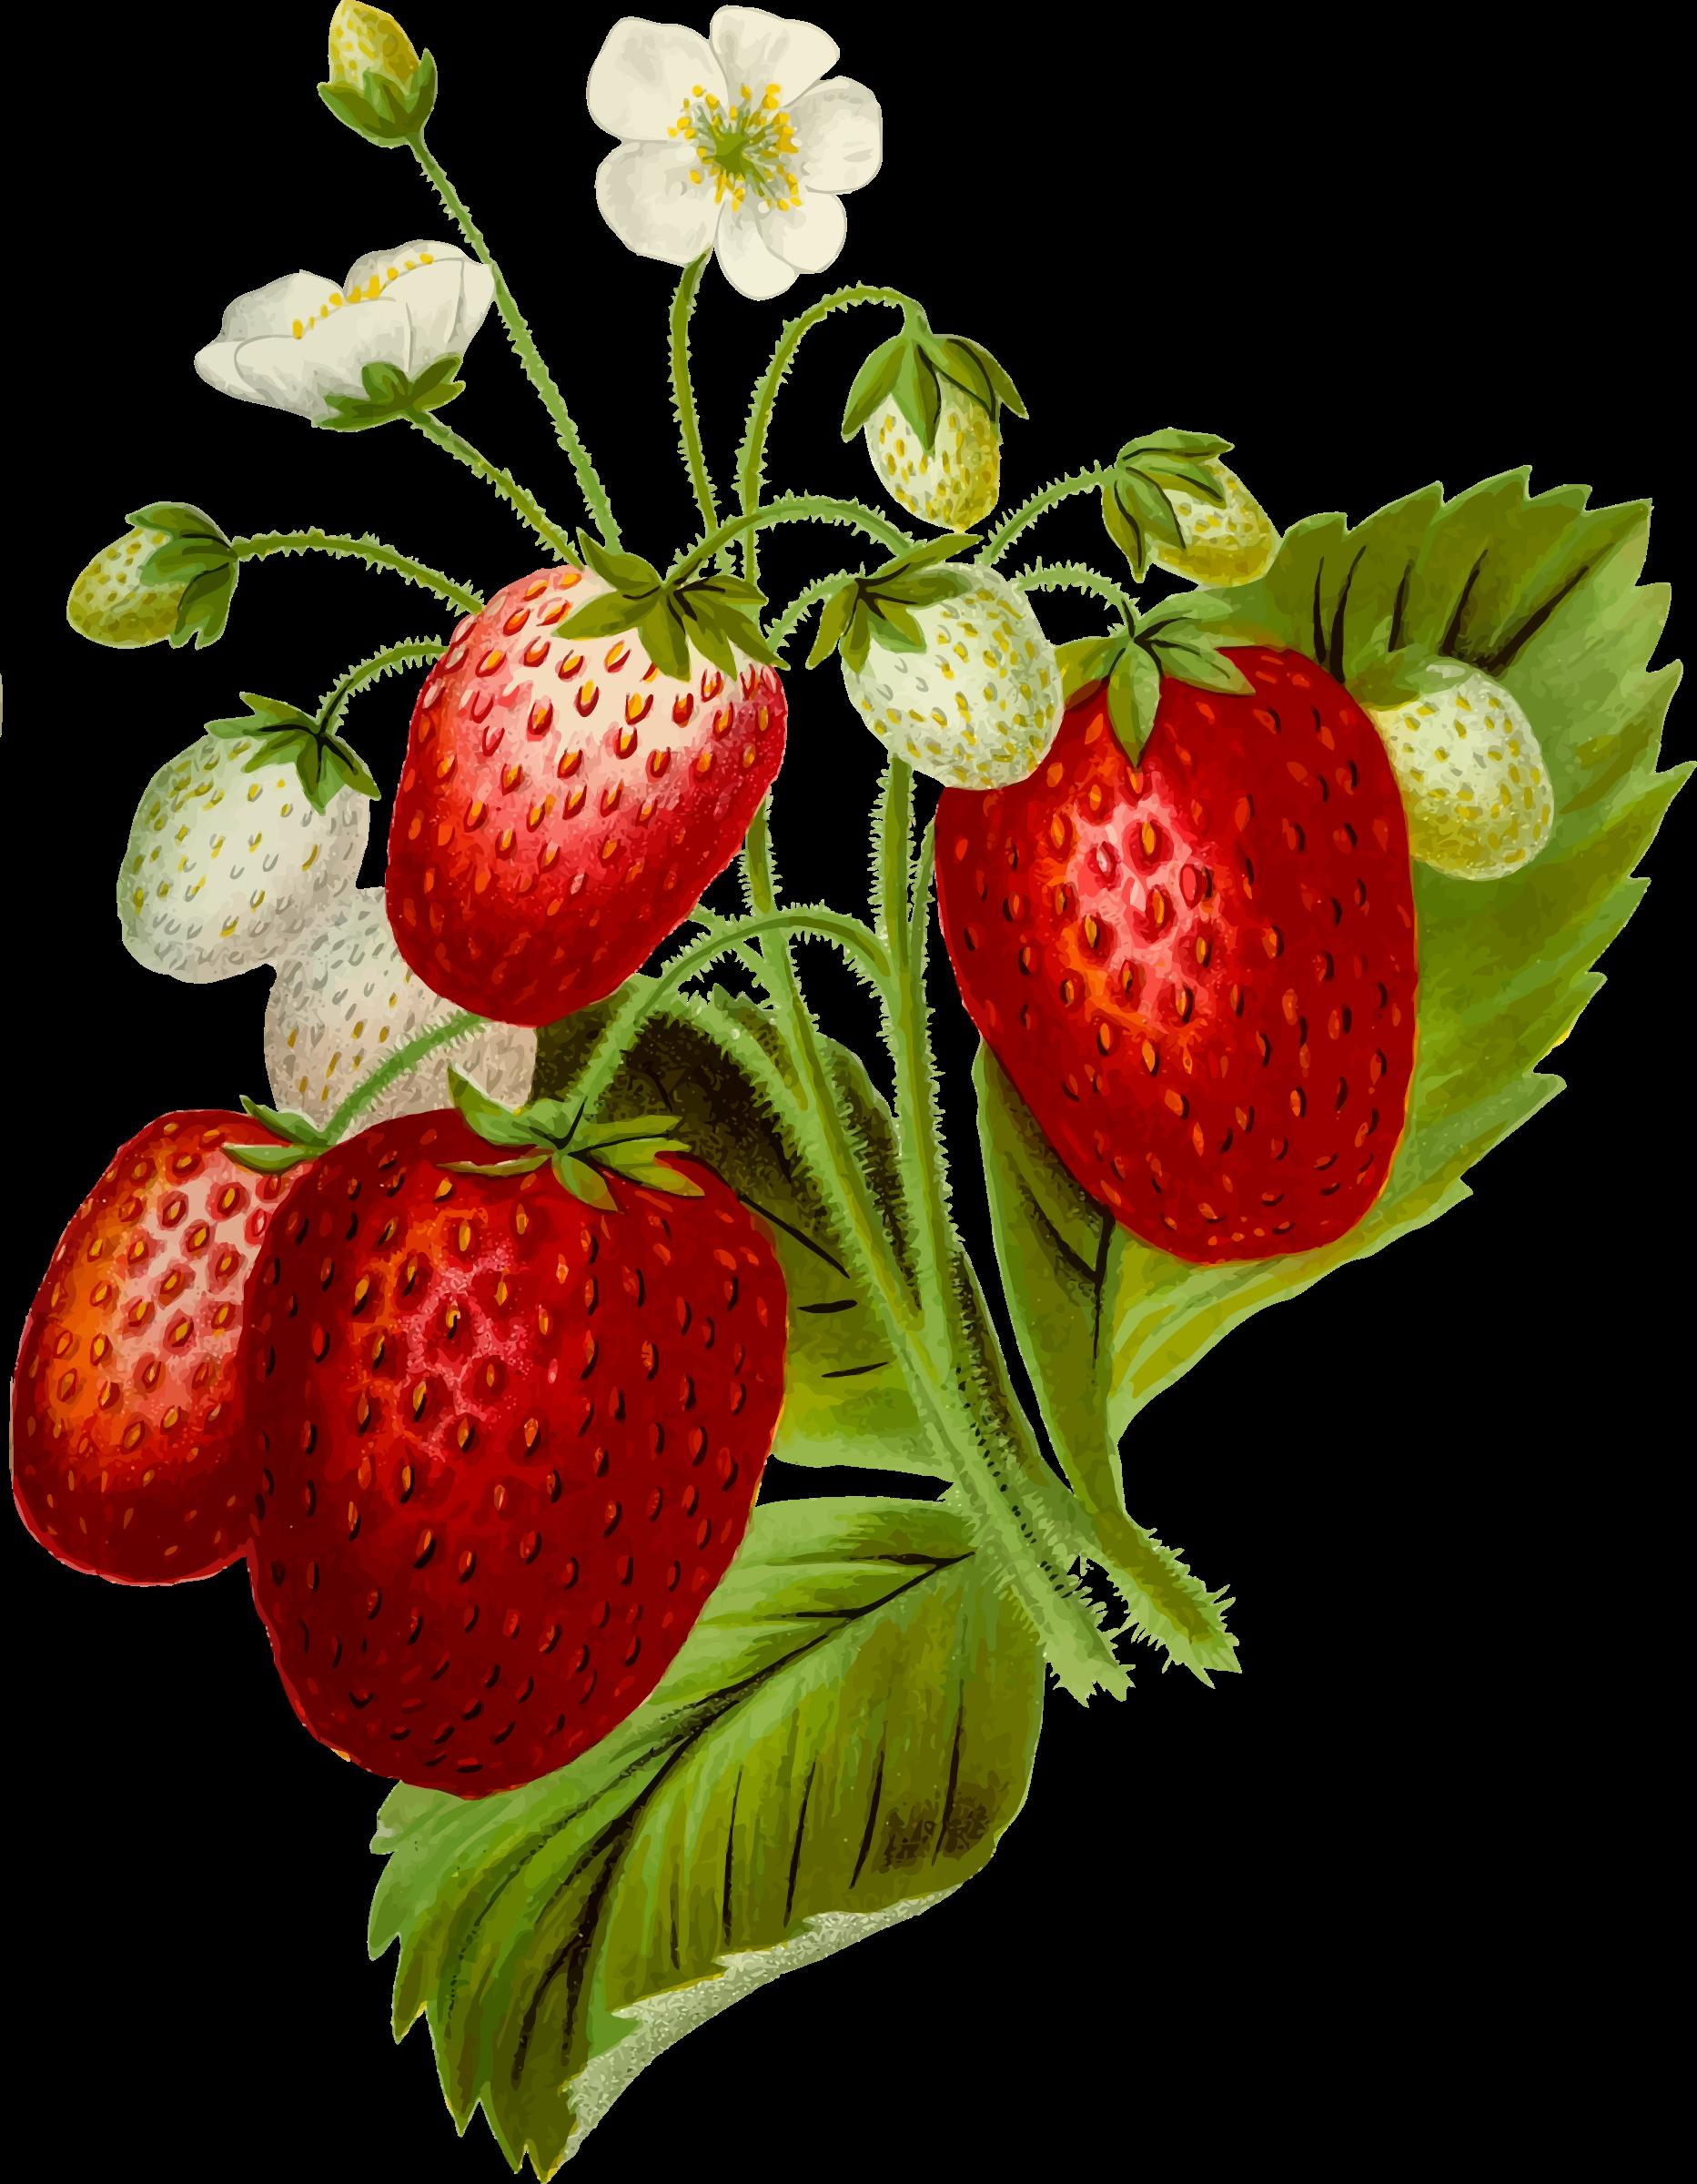 Strawberries clipart fun fruit. Big image png